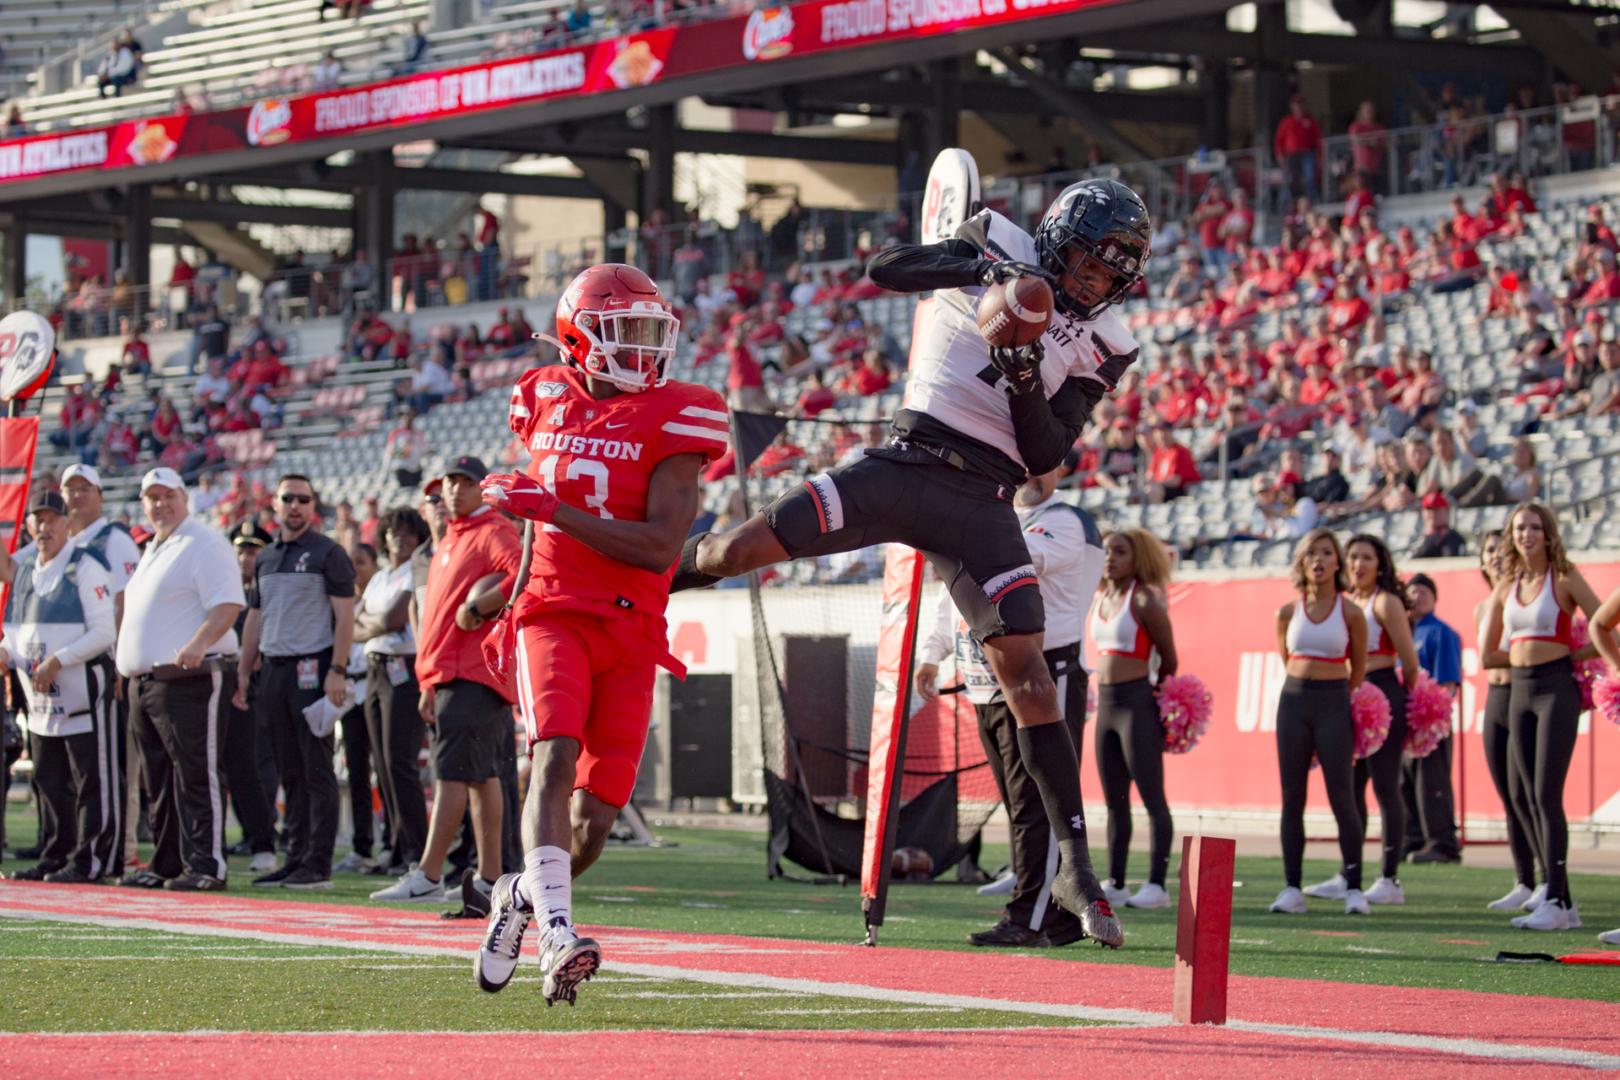 Cincinnati receiver Blue Smith skies over Houston cornerback Marcus Jones for the score at TDECU Stadium in an AAC battle during the 2019 season. | Trevor Nolley/The Cougar